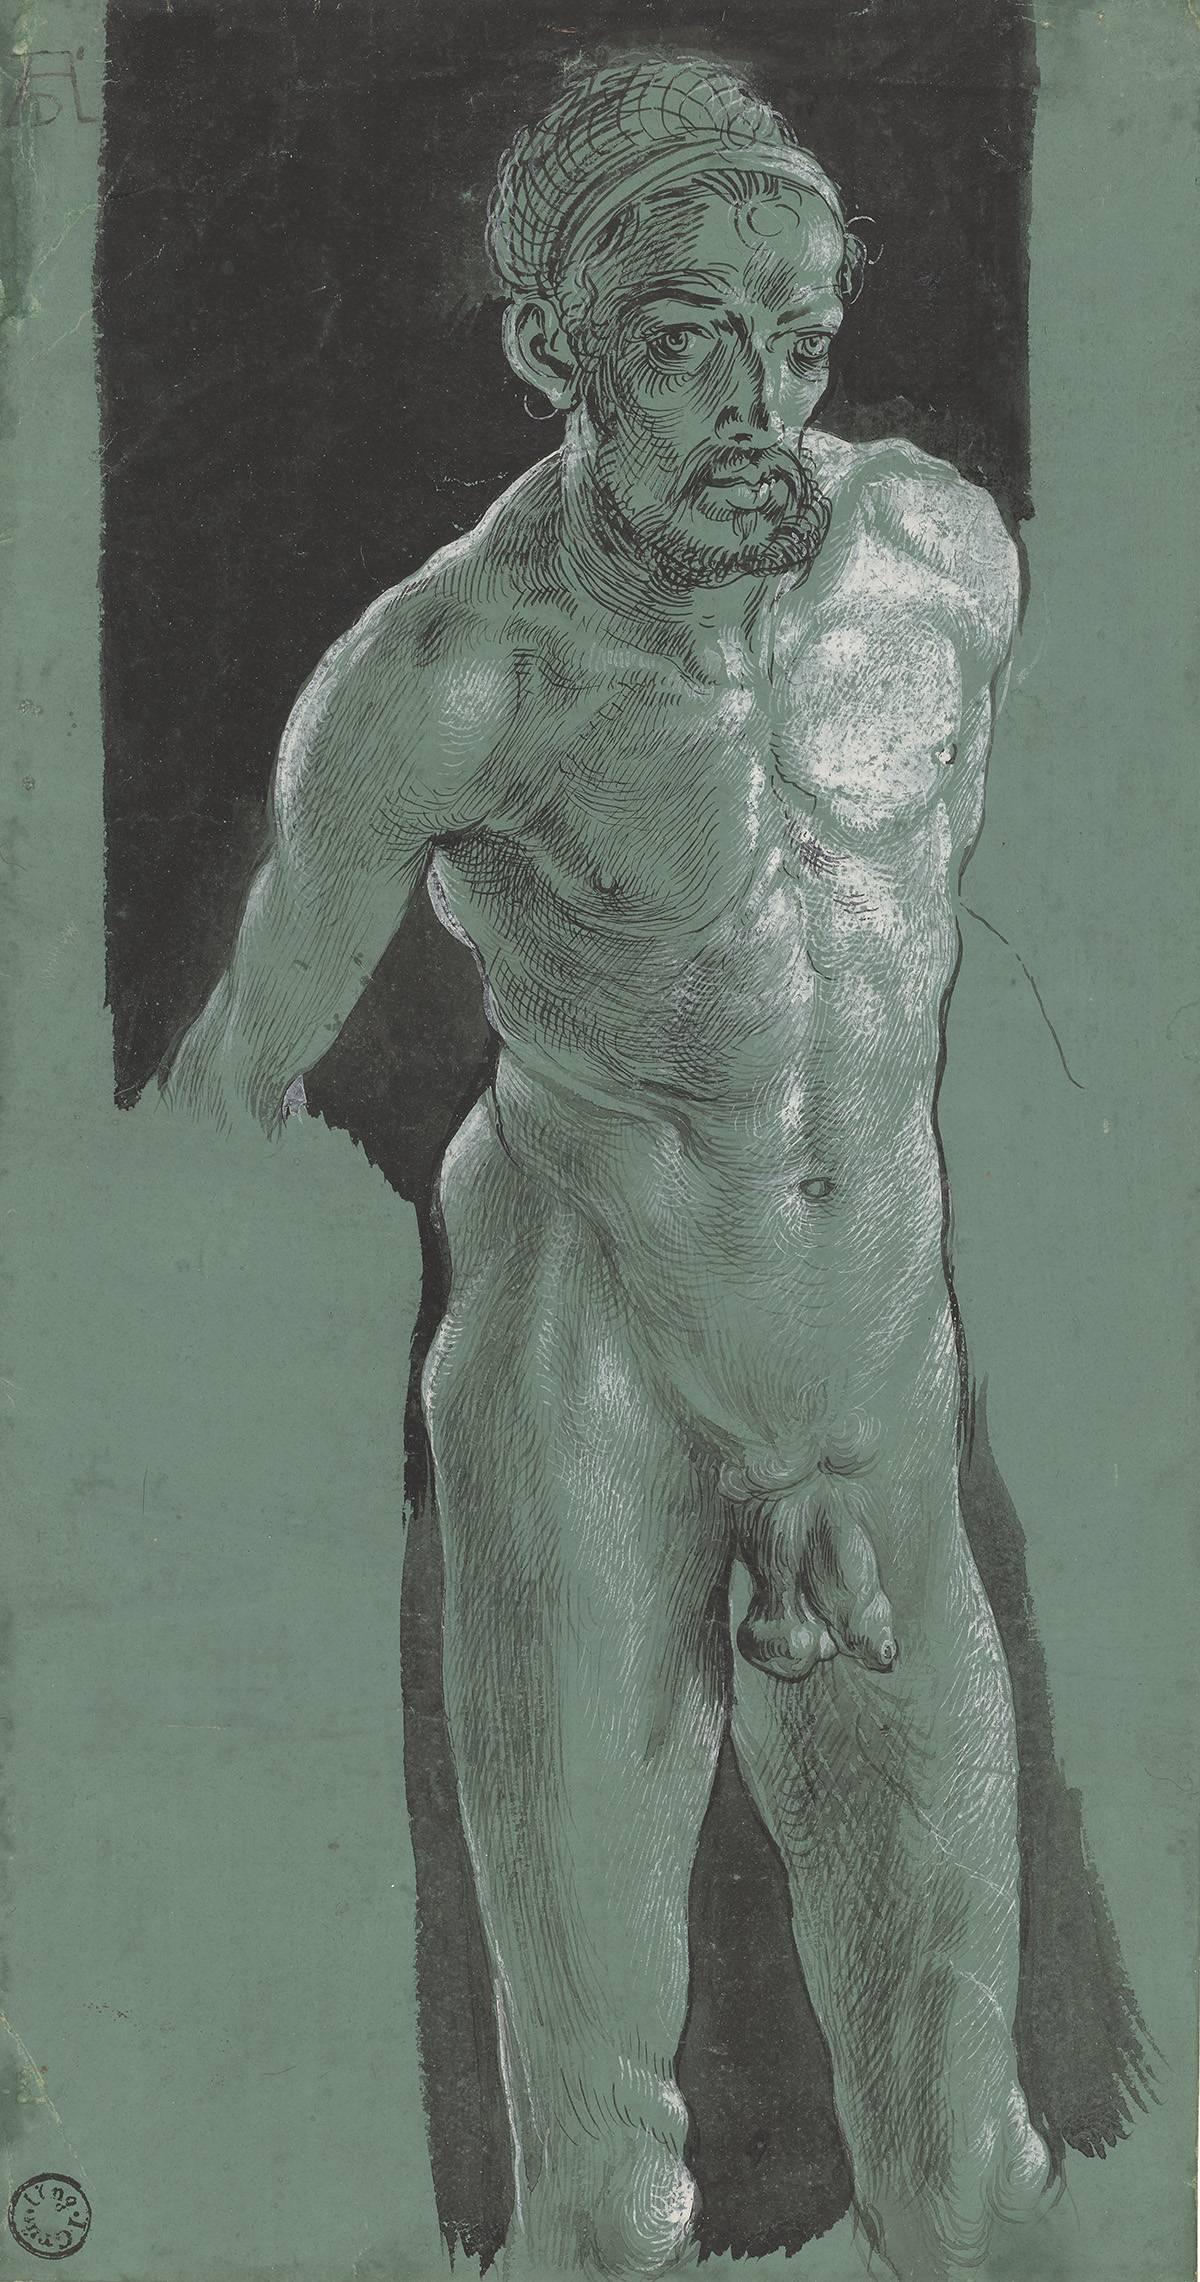 Albrecht Dürer: autoritratto nudo, c. 1499